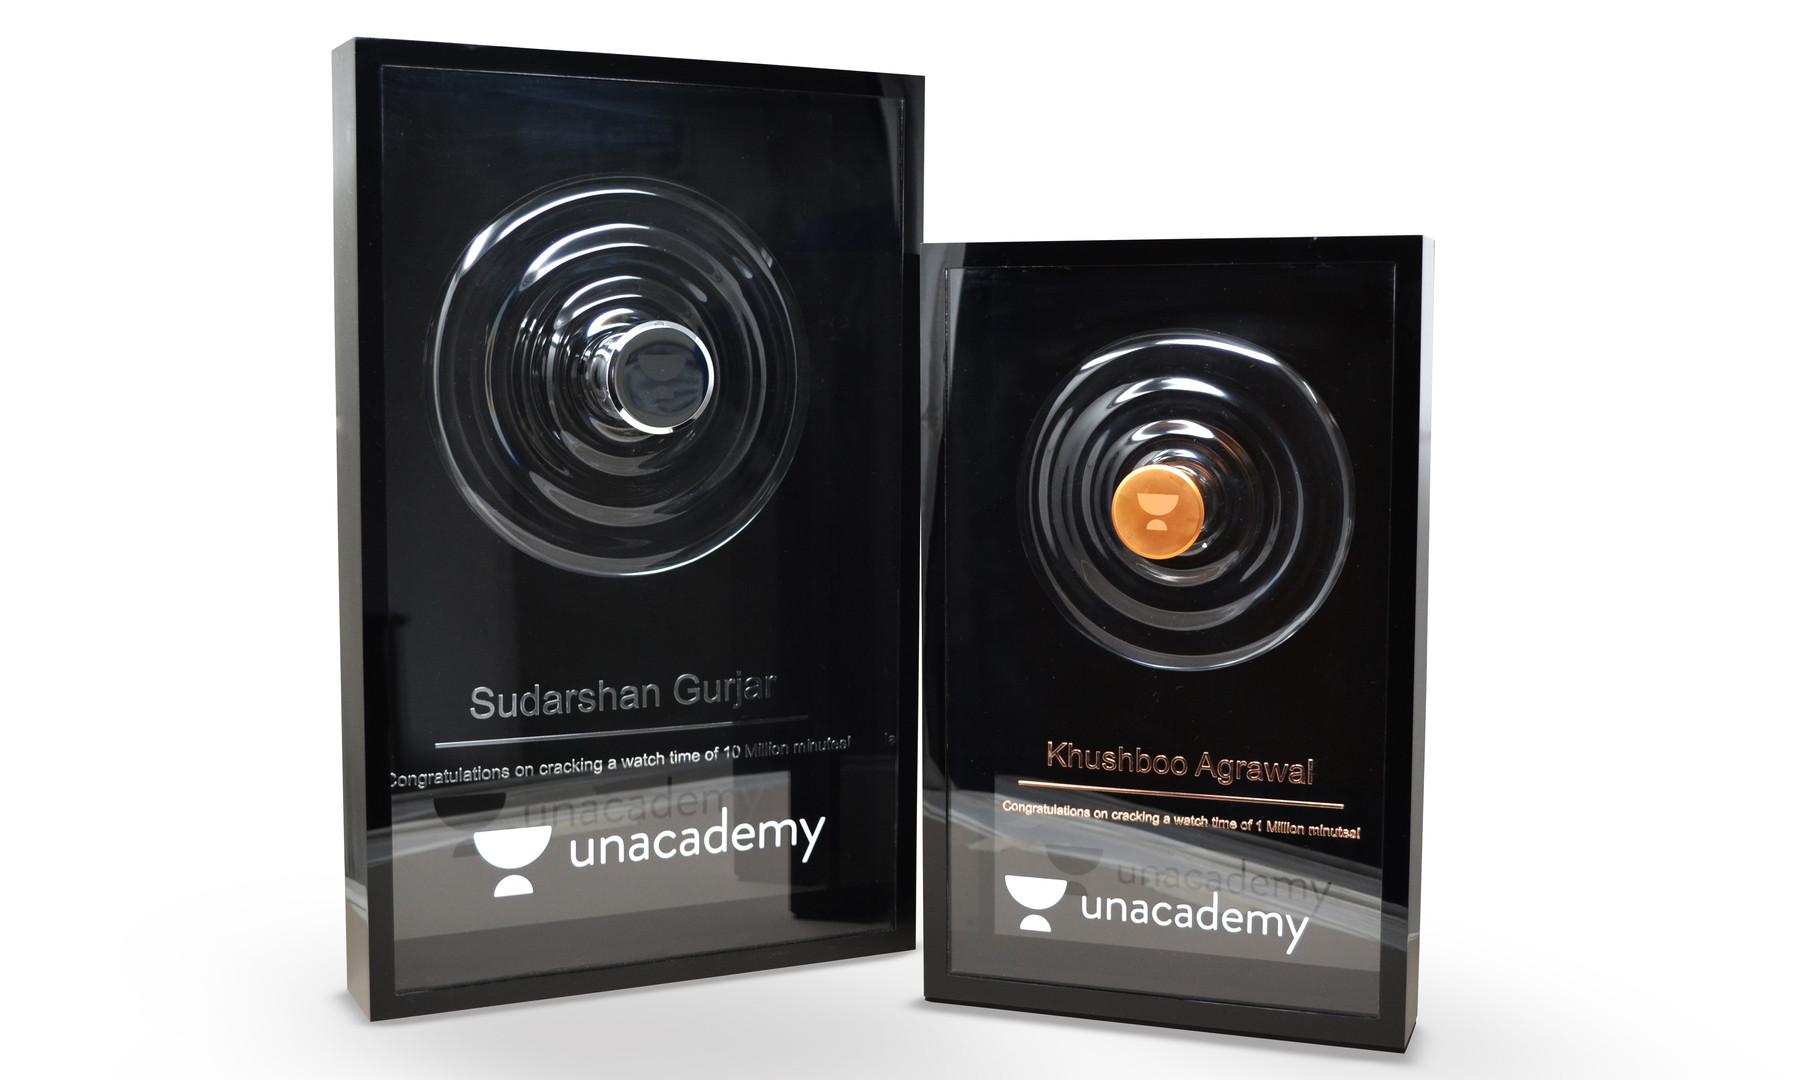 Unacademy Trophy